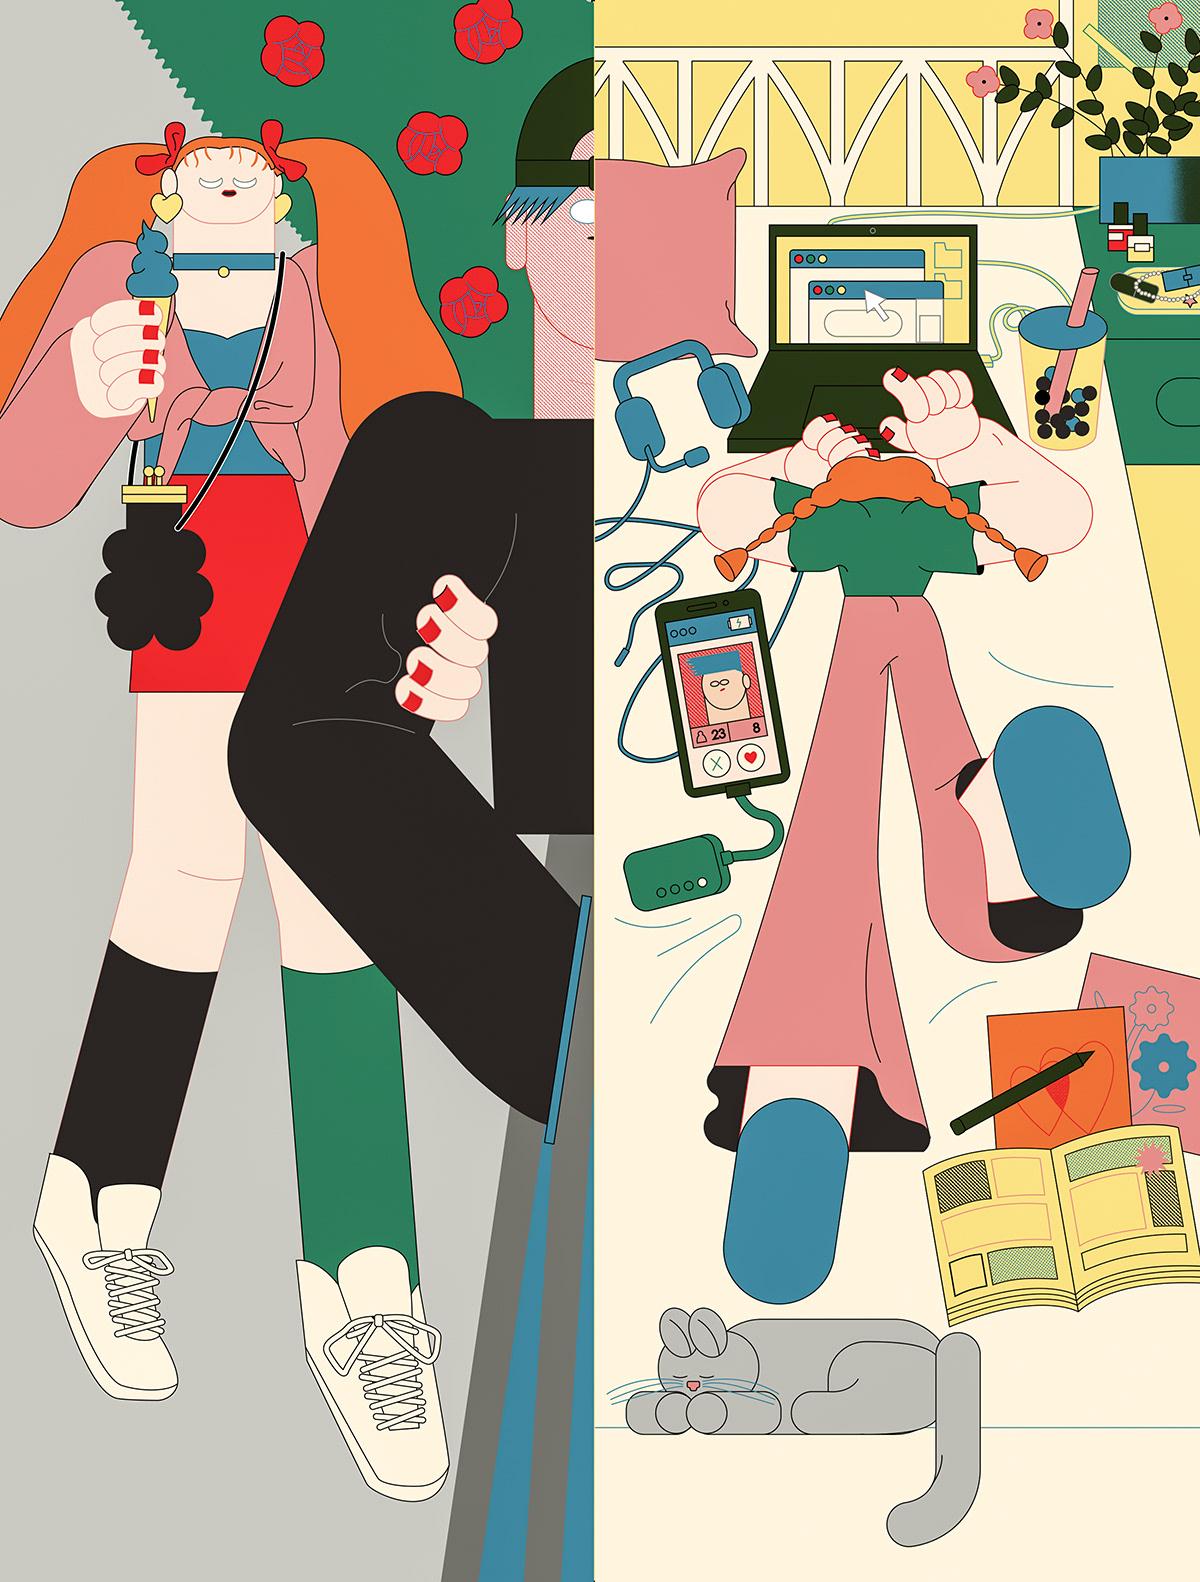 Image may contain: cartoon, drawing and poster